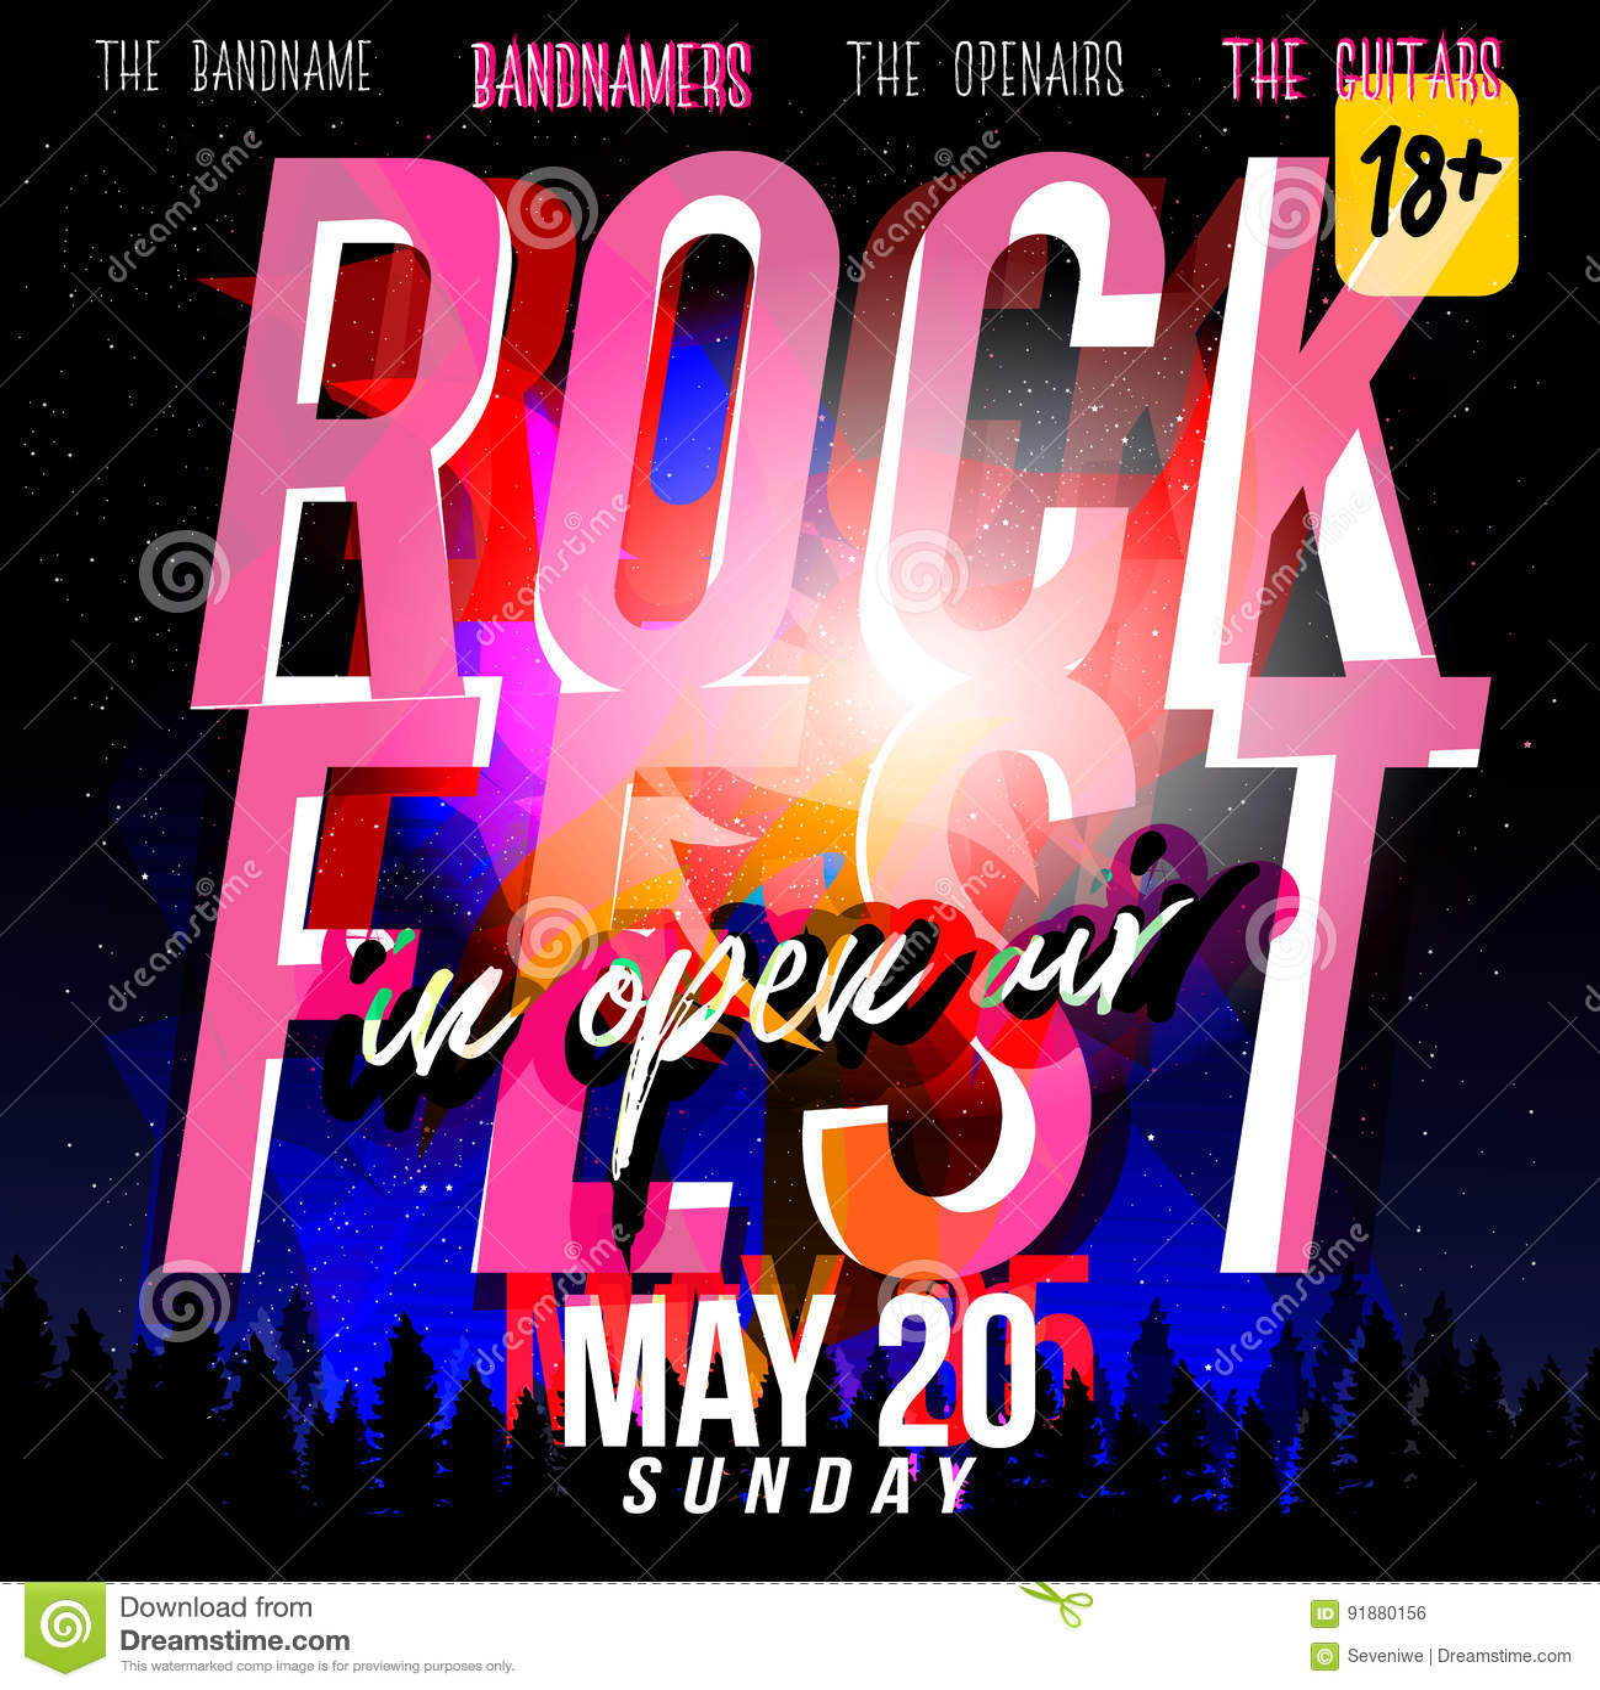 70s poster design template - Rock Festival Flyer Design Template Modern Style 70s 80 Stock Vector